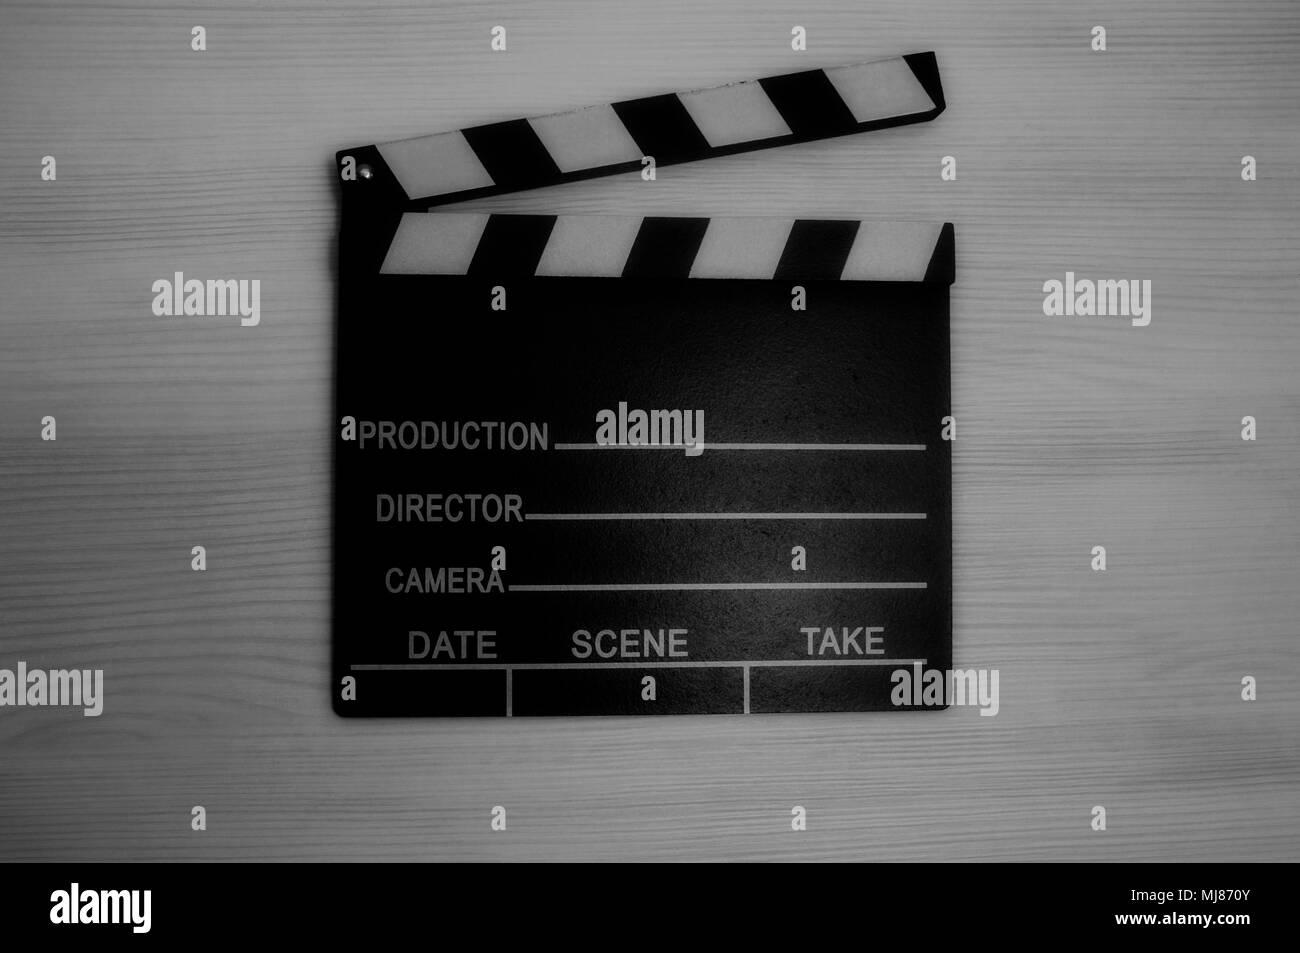 Production clapboard black and white photo - Stock Image